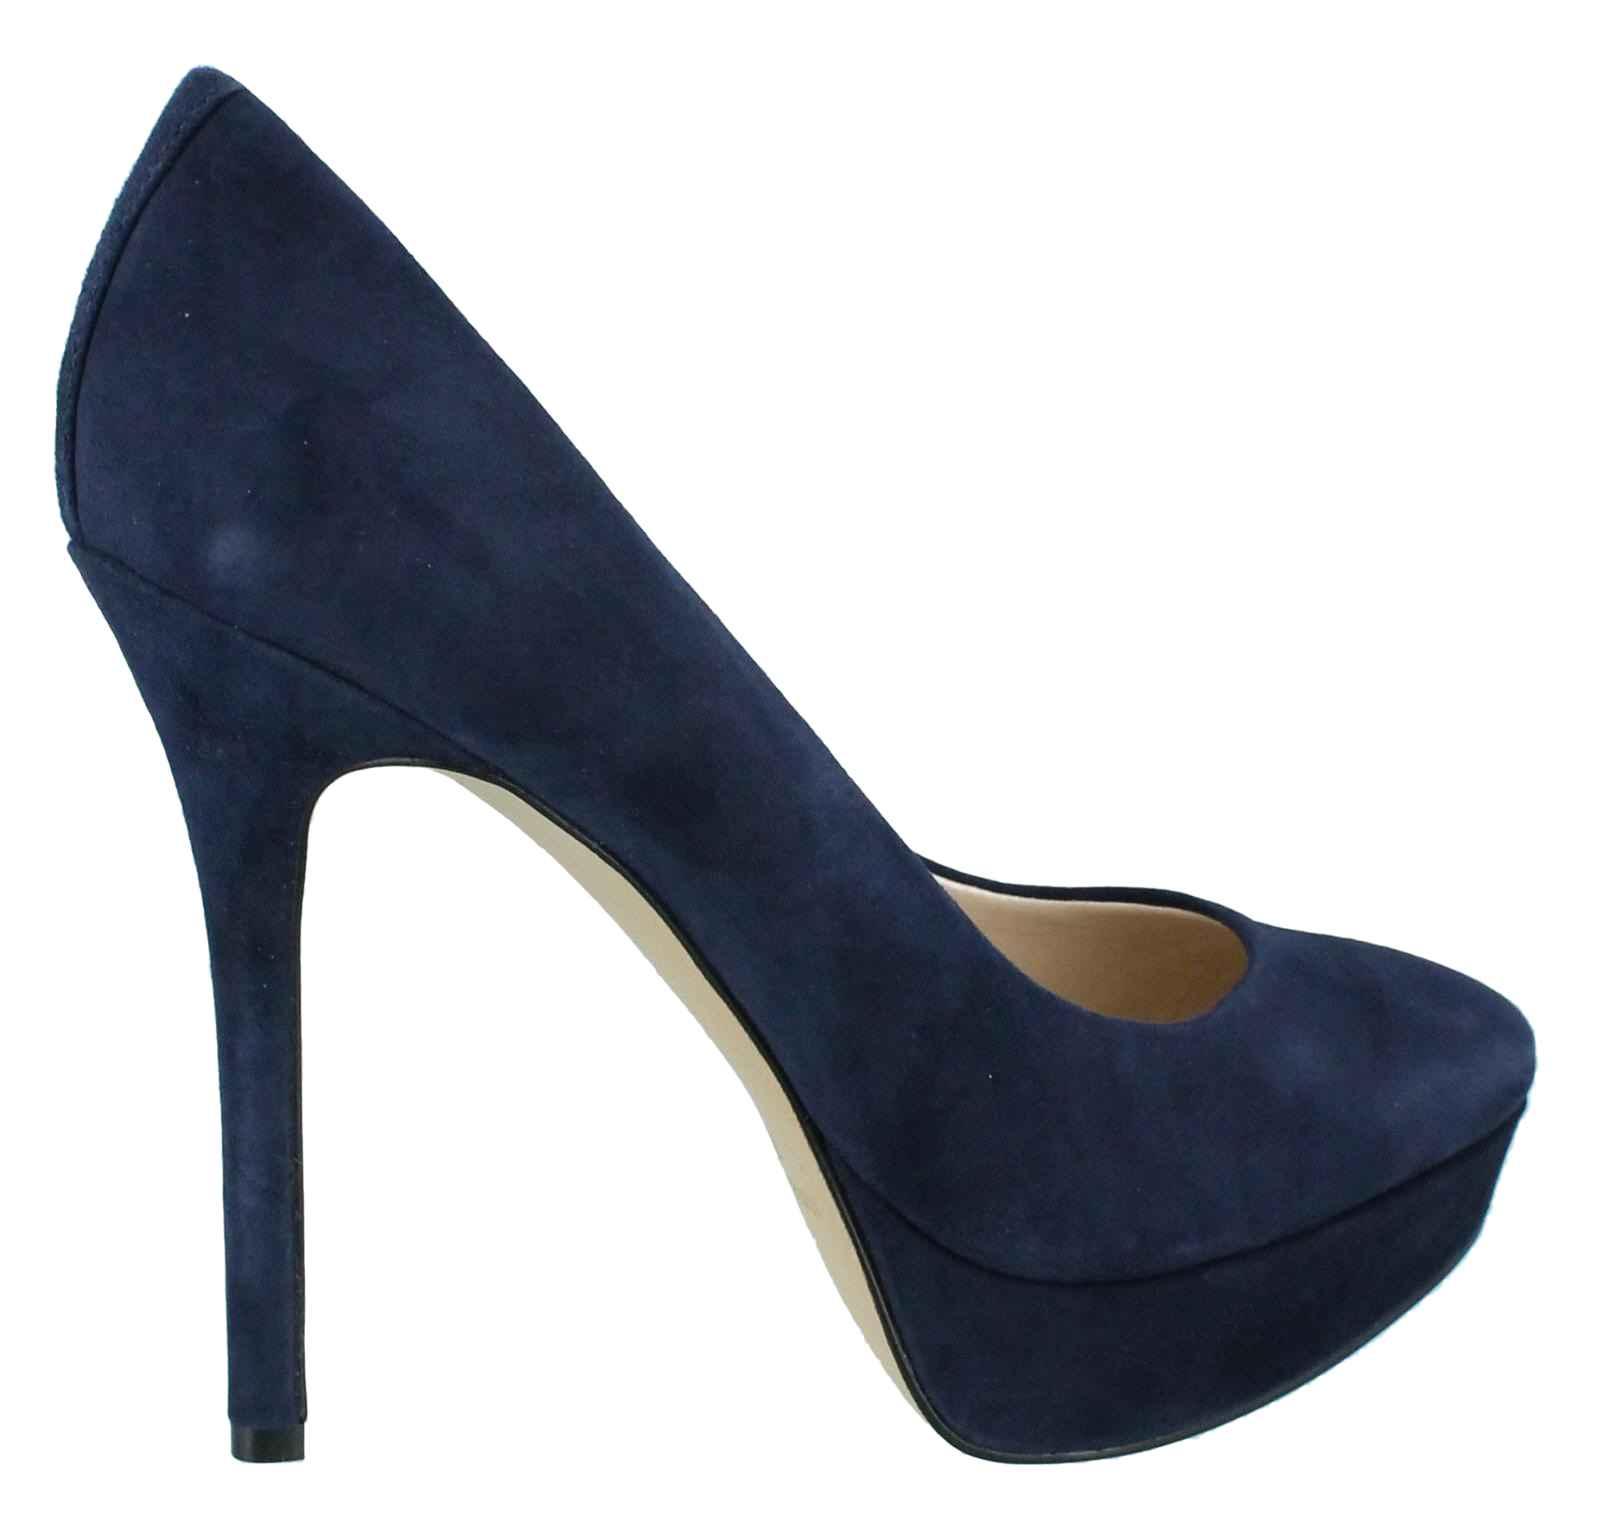 beautiful navy high heels with stylish design ideas jkdmfzc